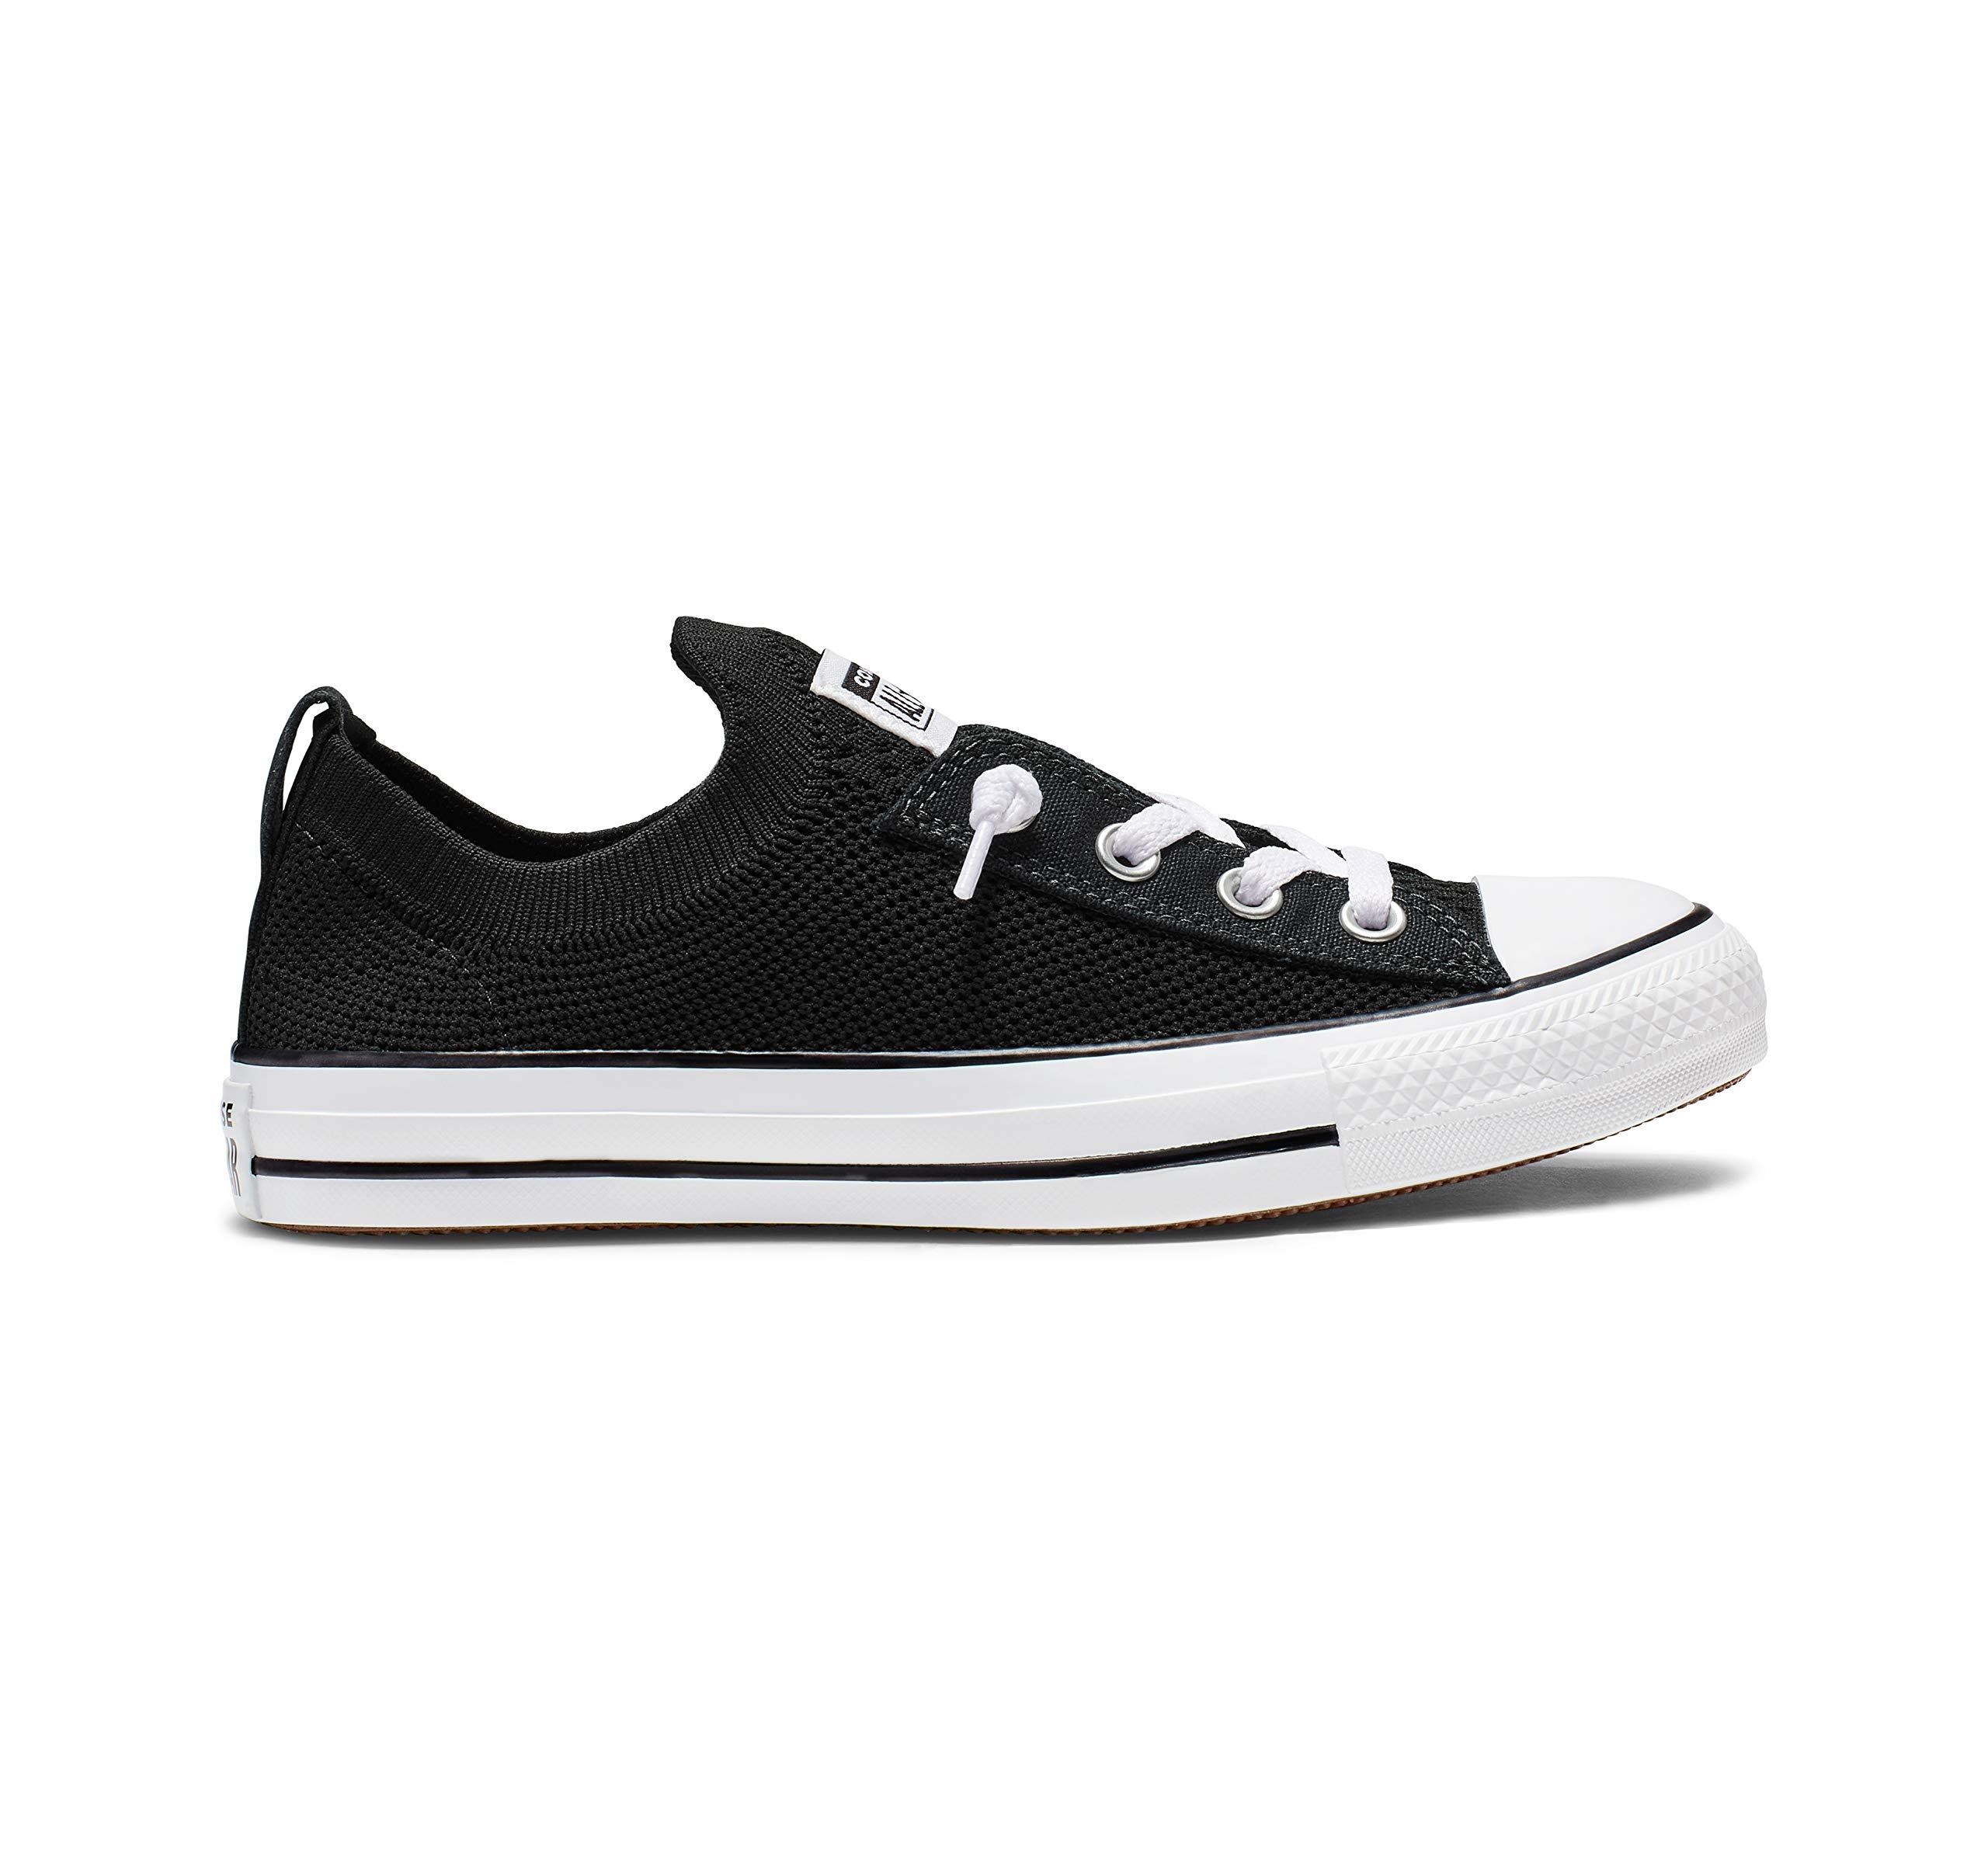 Converse Women's Chuck Taylor All Star Shoreline Knit Slip On Sneaker White/Black, 8.5 M US by Converse